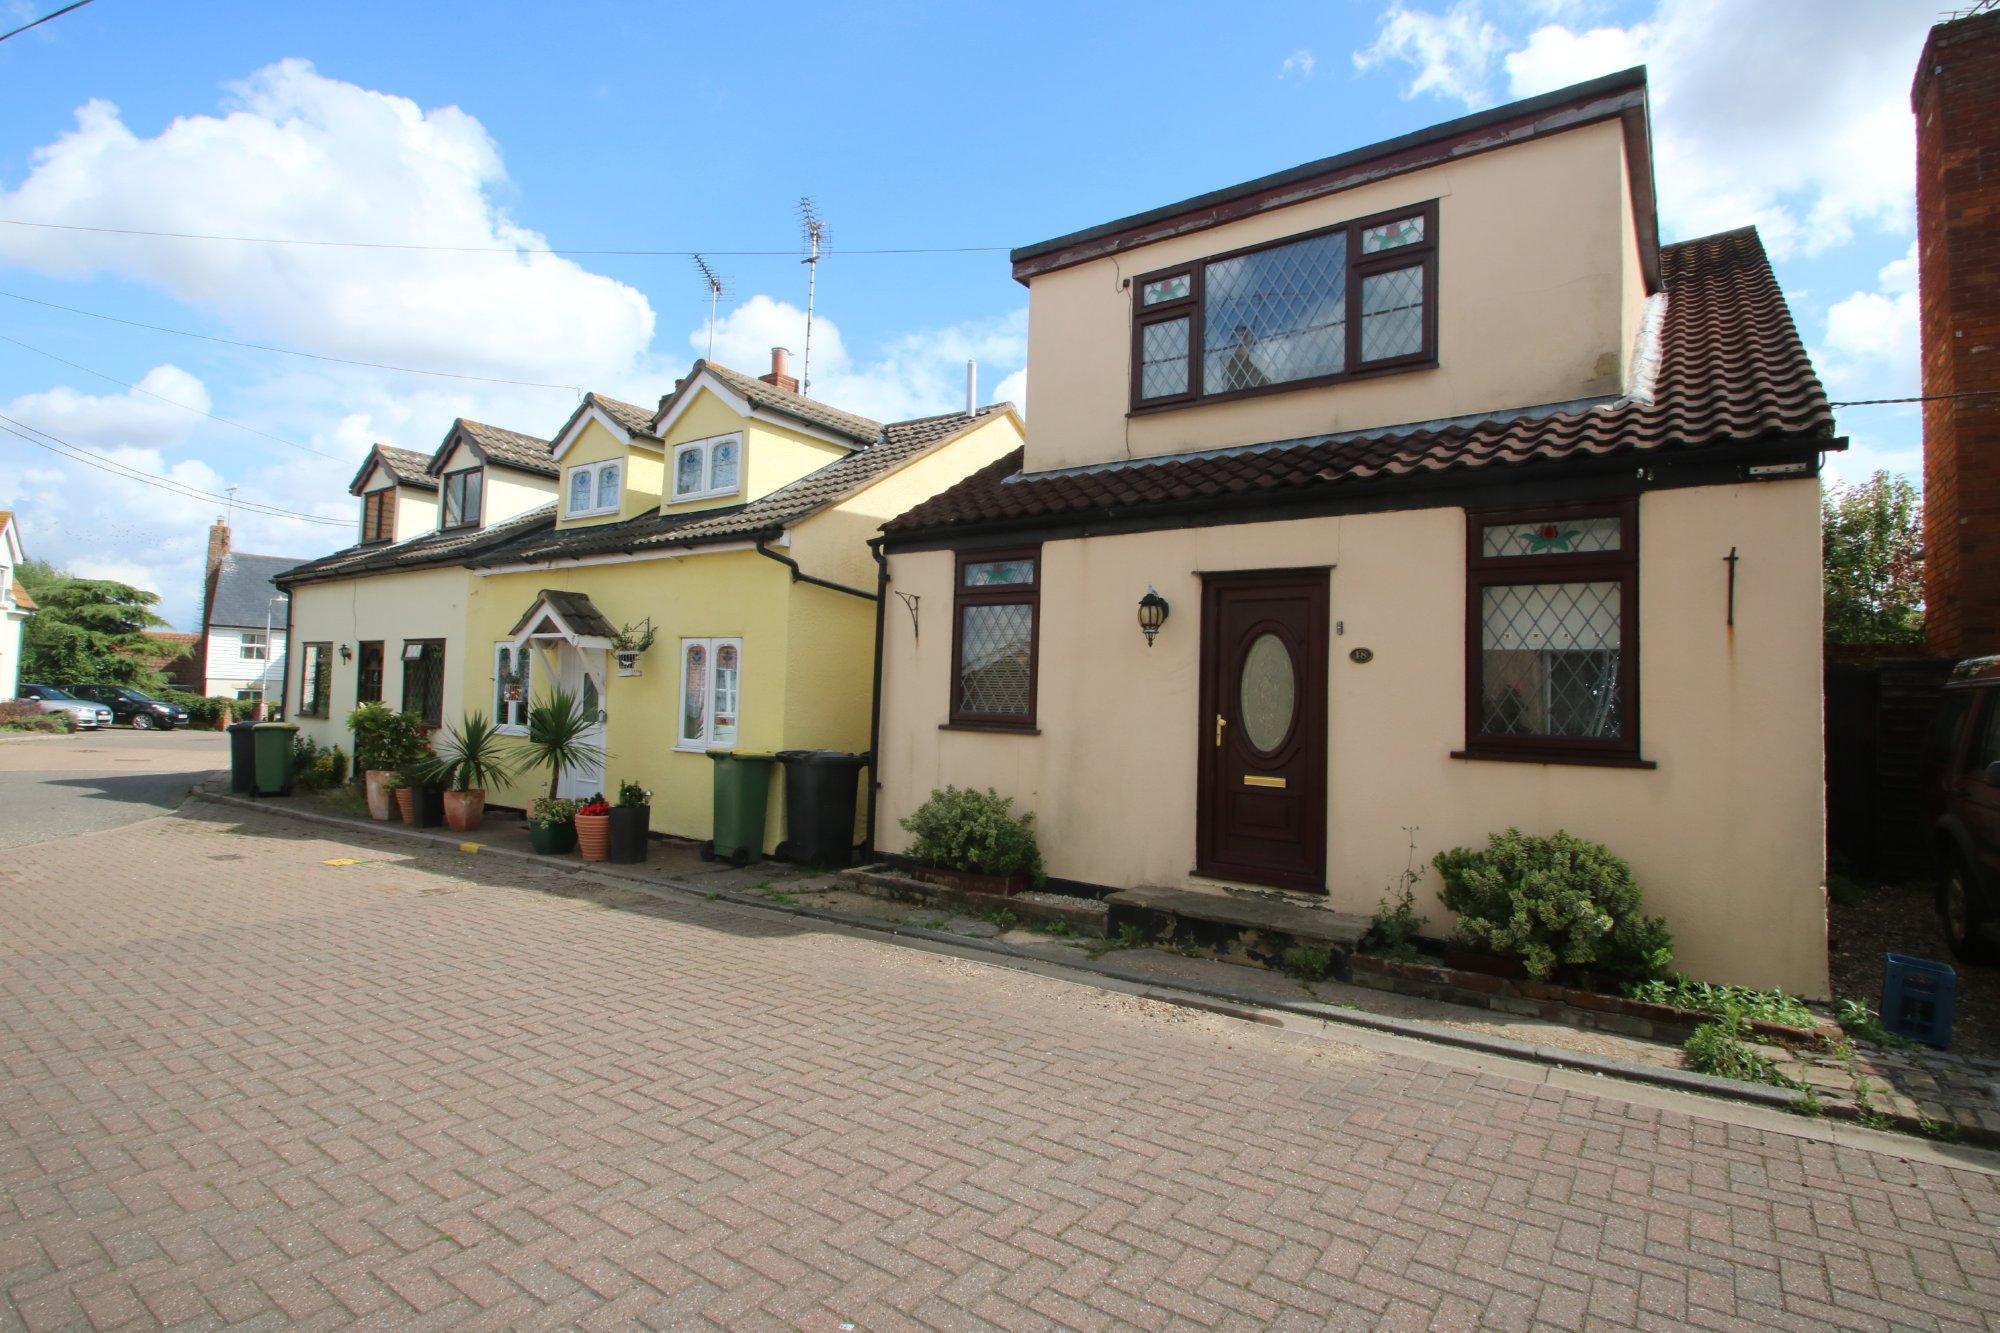 St Thomas Road, South Fambridge